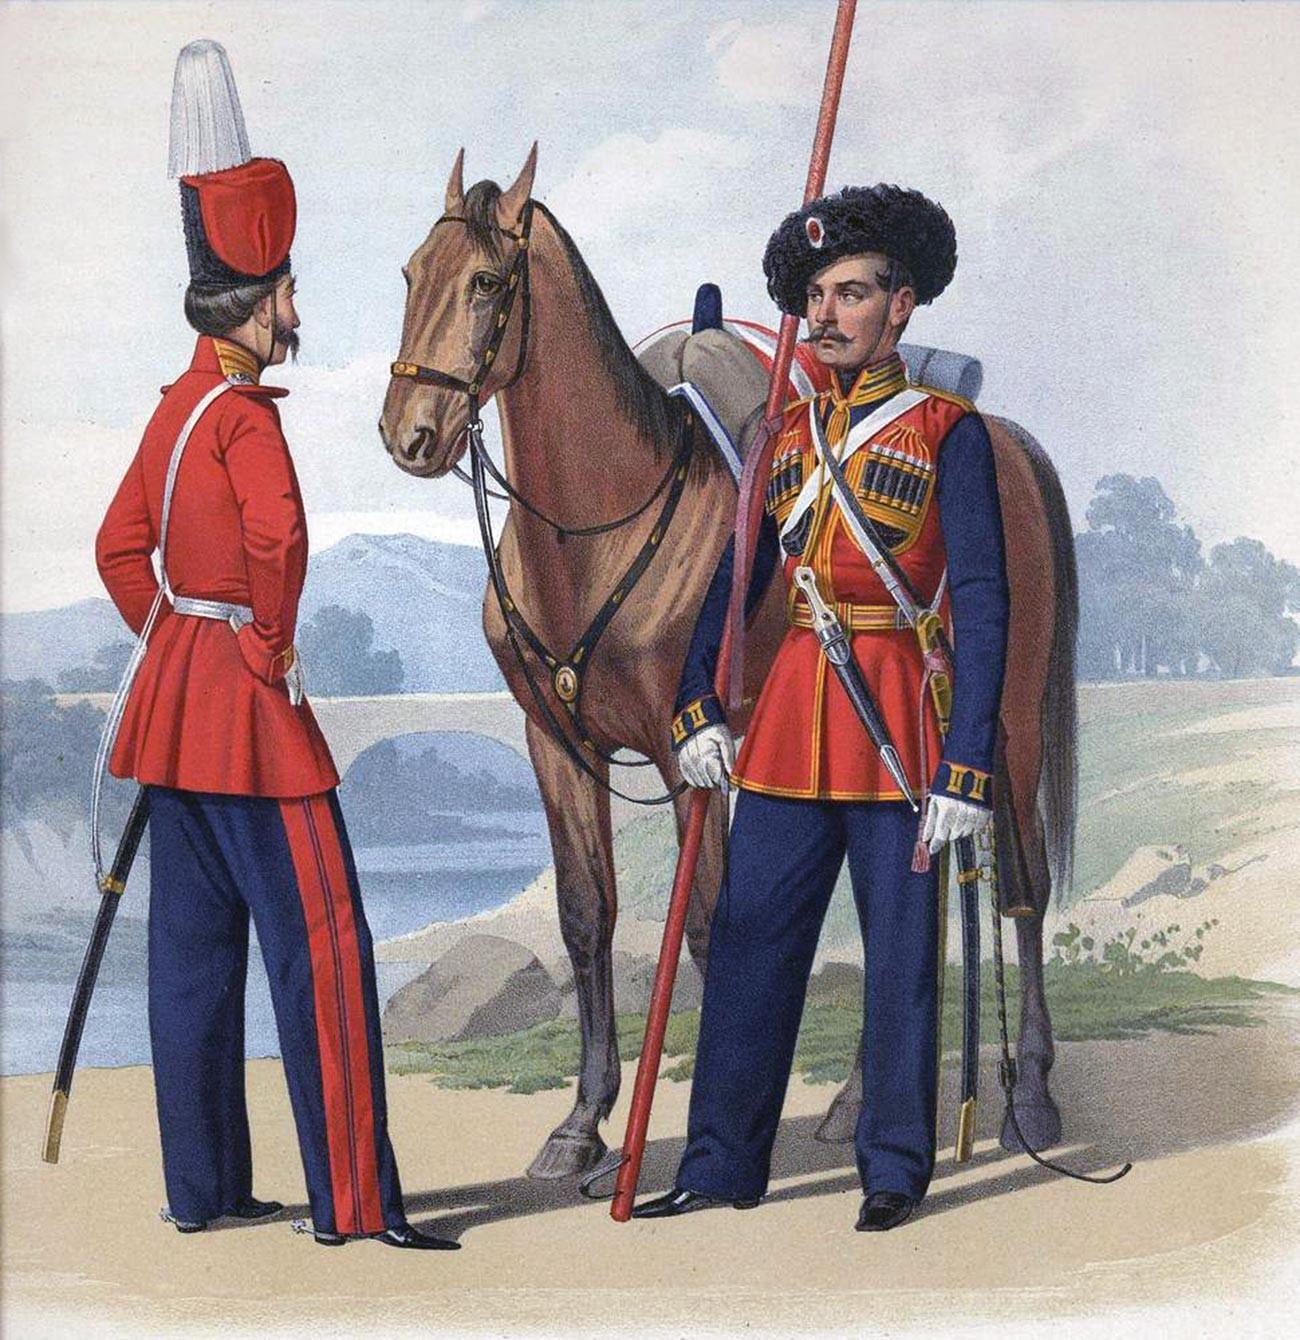 The Cossacks of the Escort (uniforms)